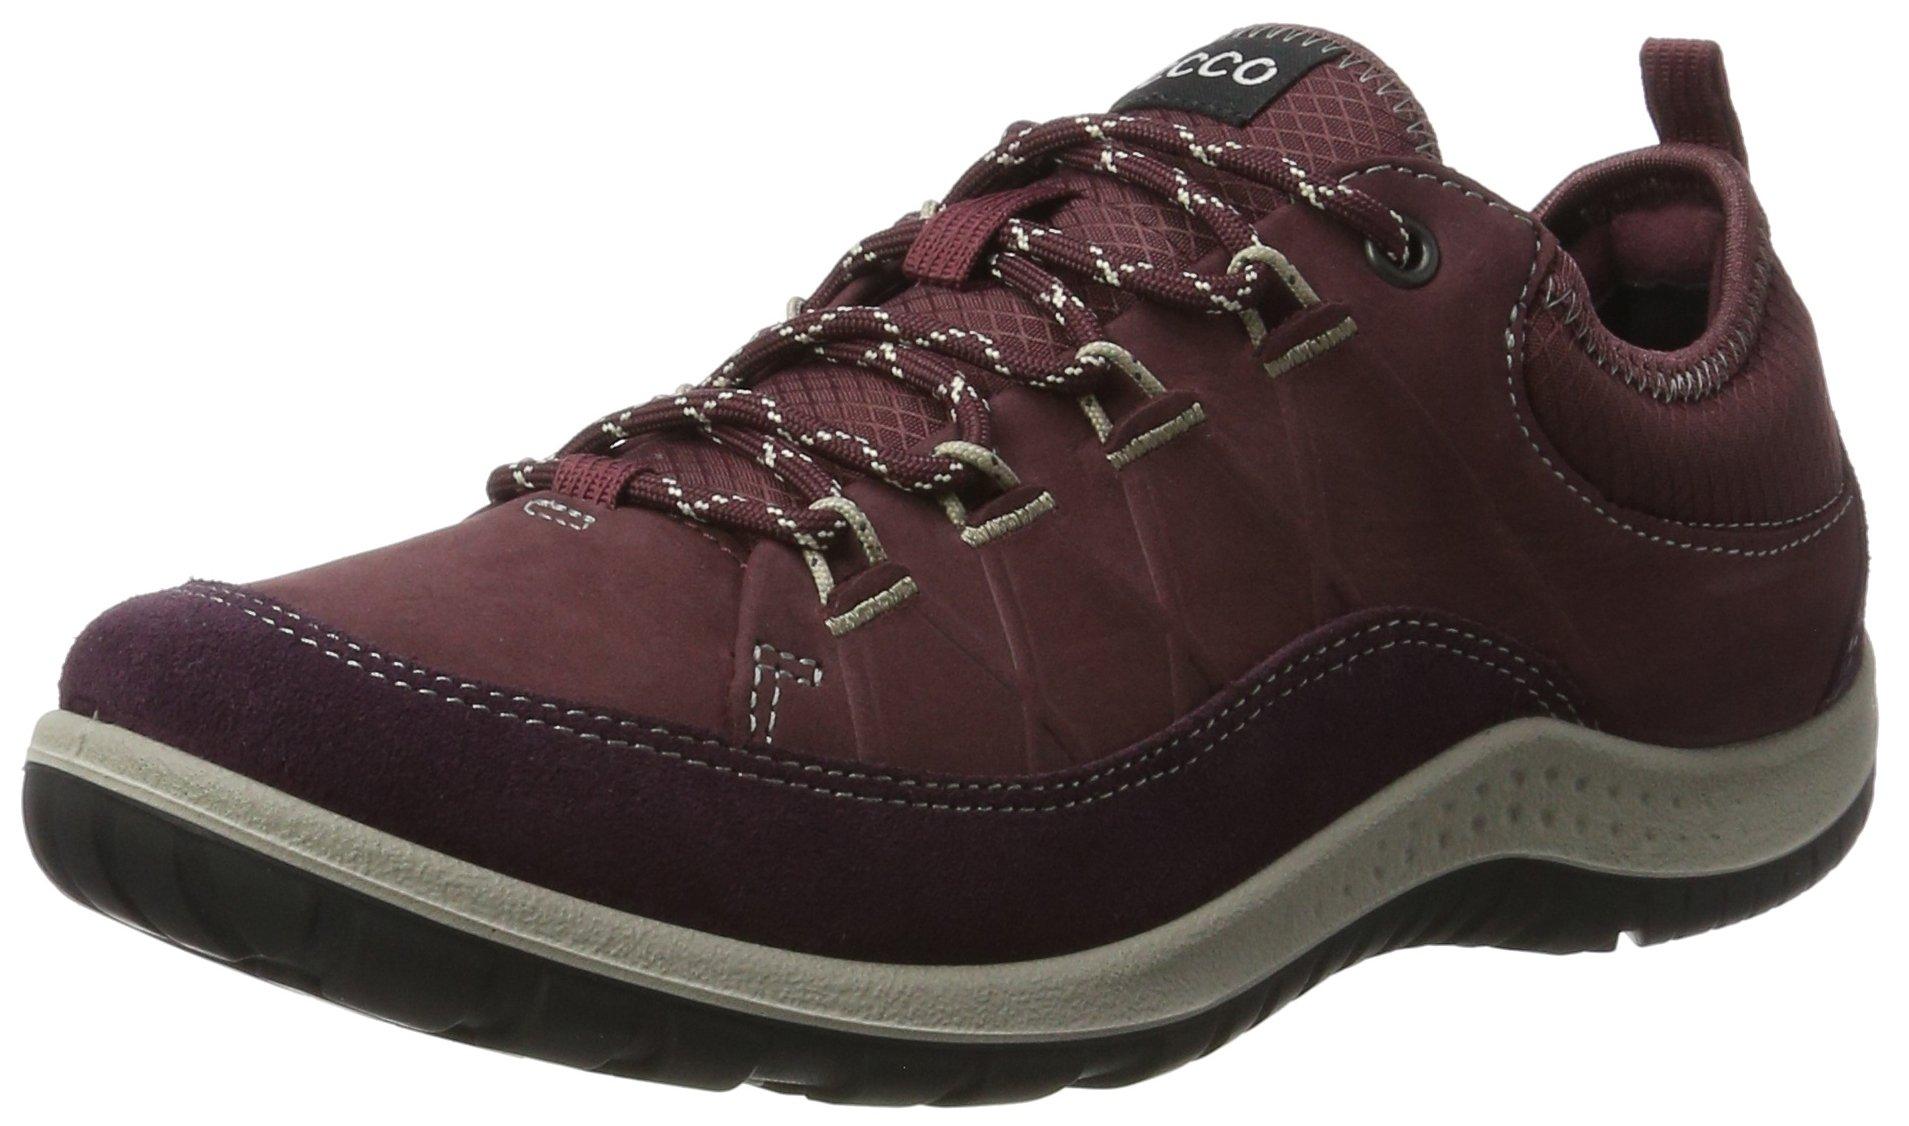 ECCO Women's Aspina Low Hiking Shoe, Mauve/Bordeaux, 37 EU/6-6.5 US